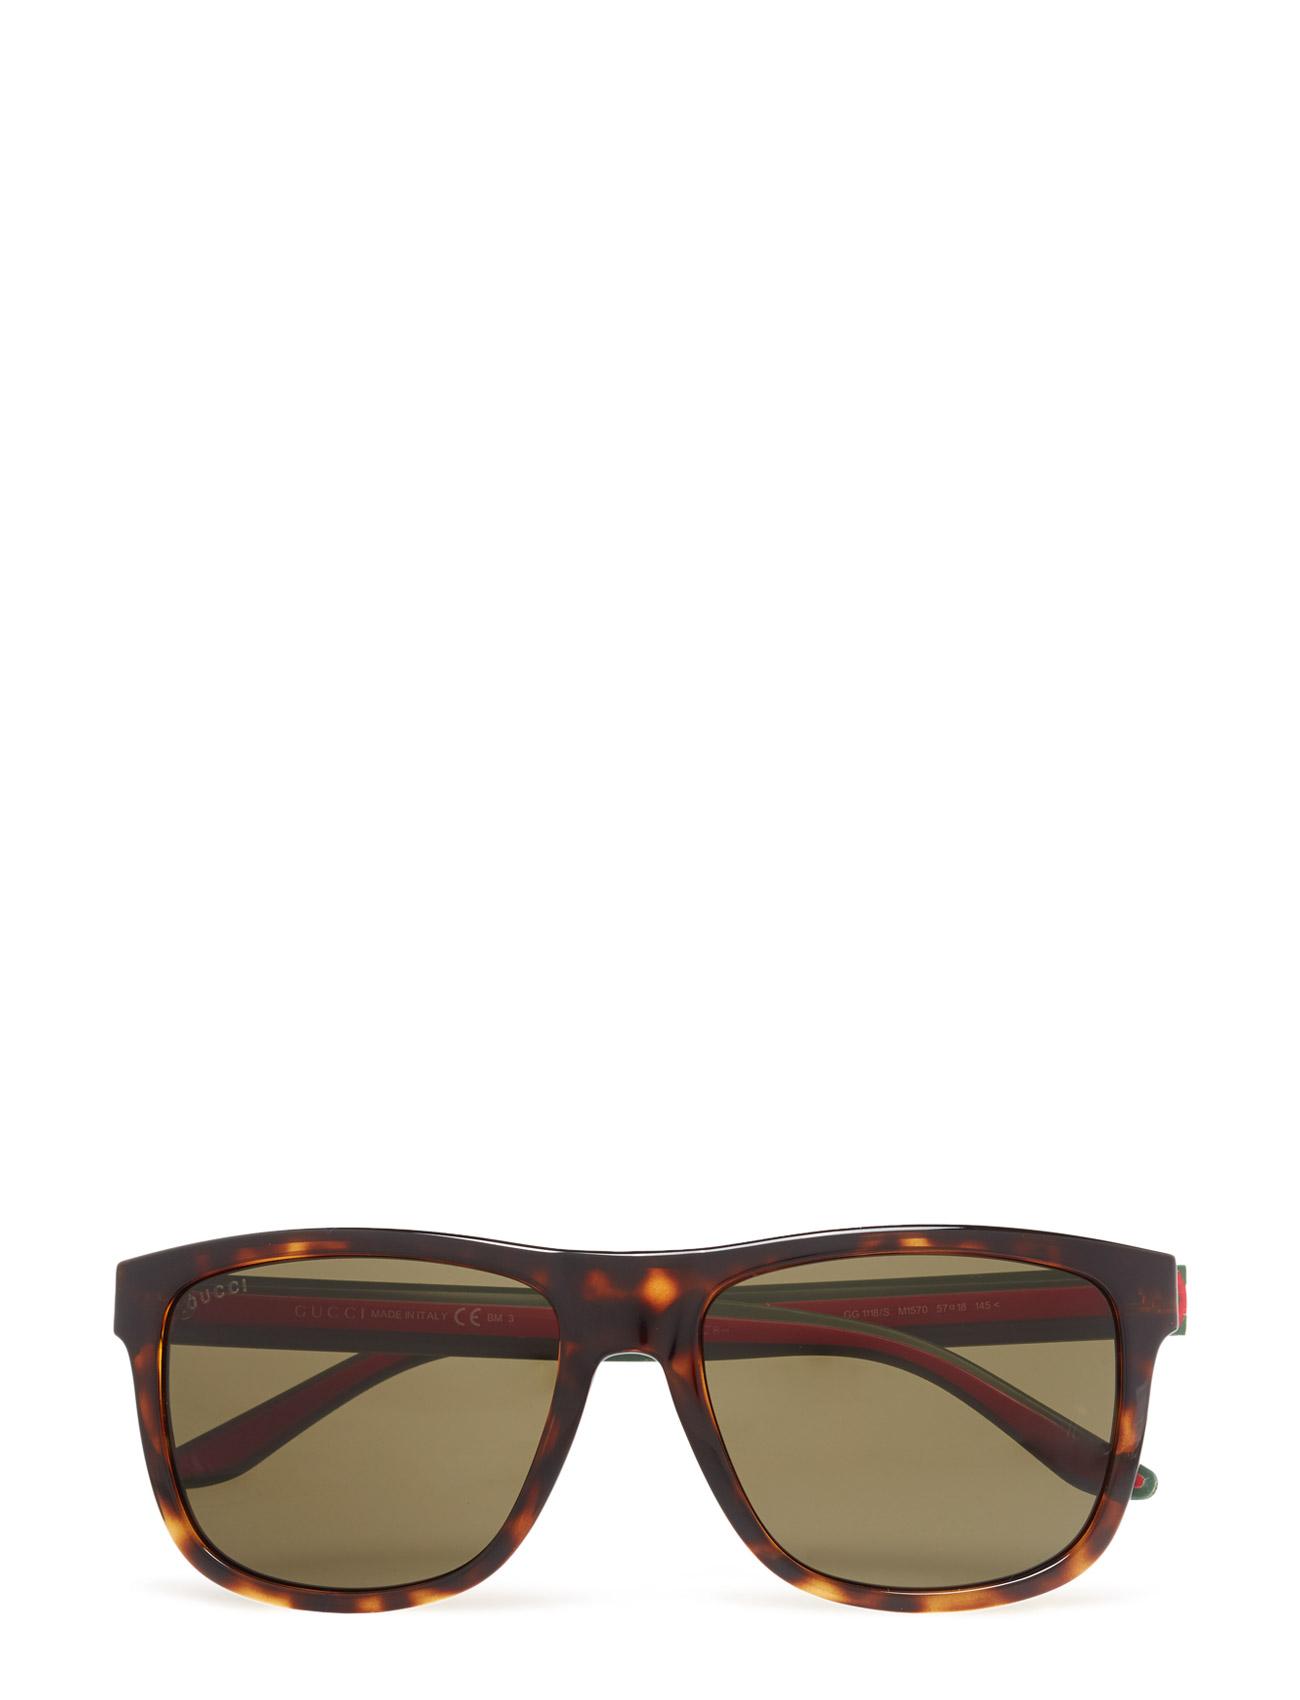 Gg 1118/S Gucci Sunglasses Accessories til Mænd i